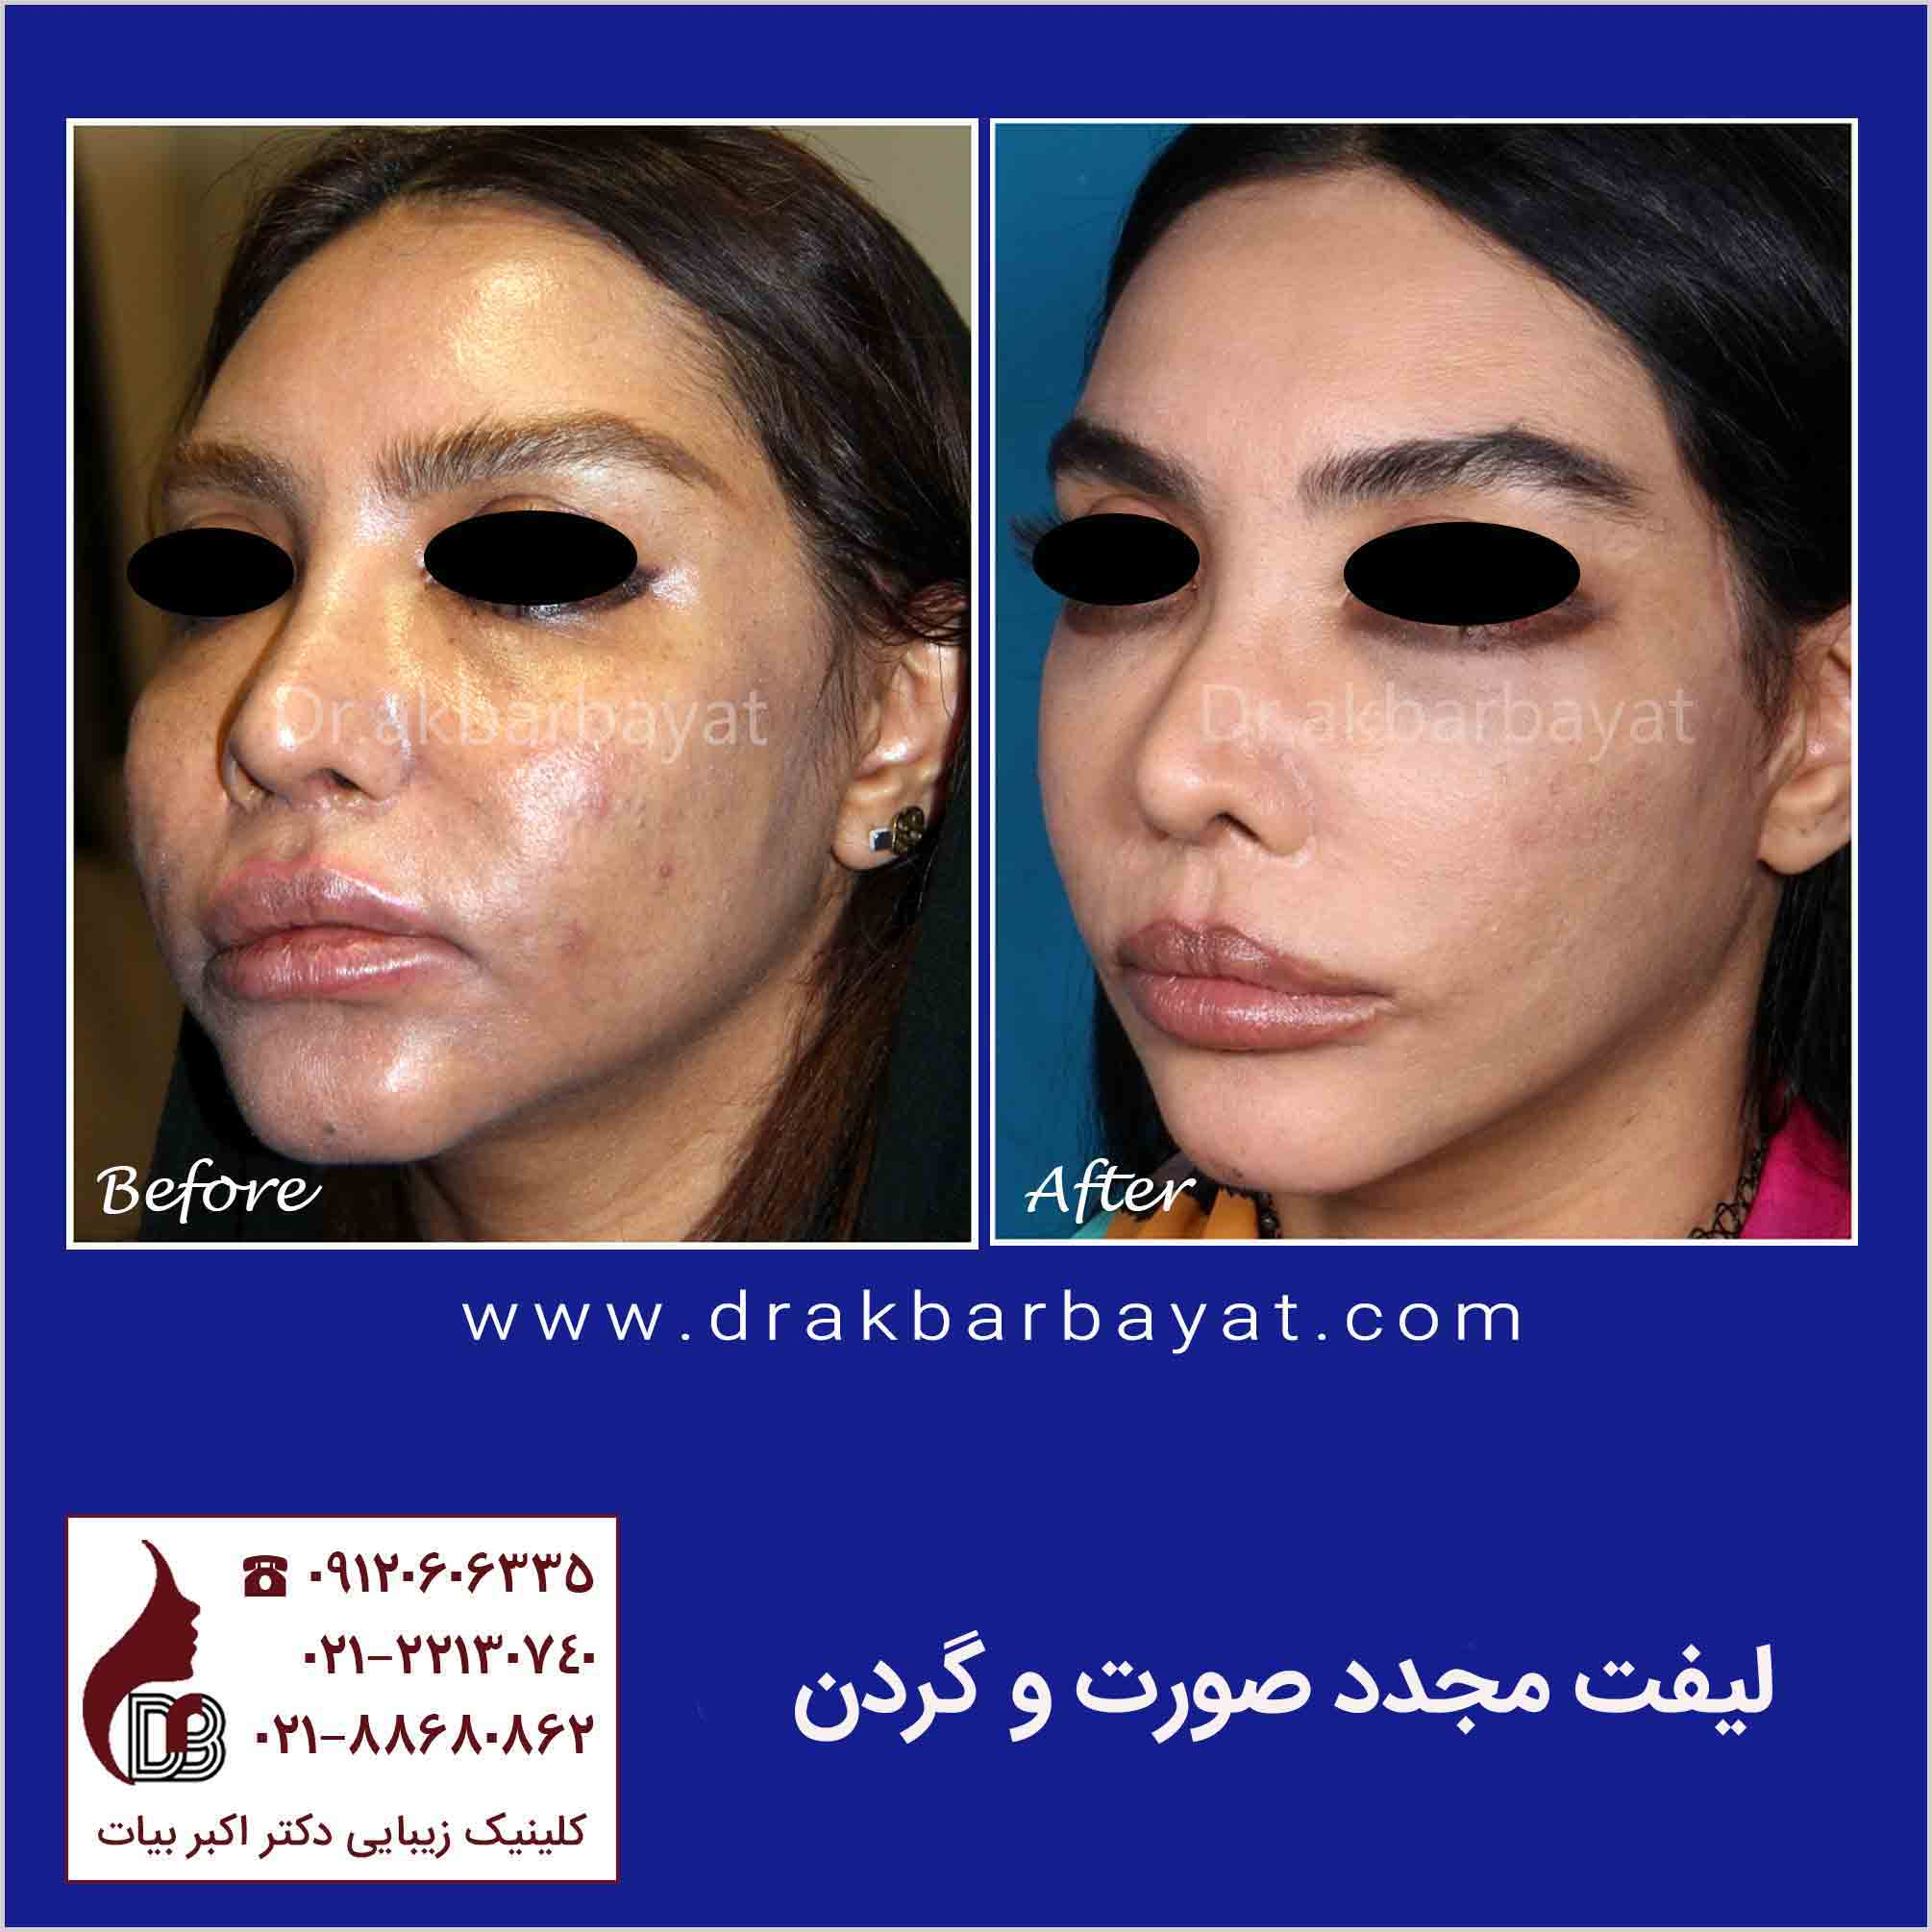 DrakbarBayat-Face Lift   جراحی ترمیمی لیفت صورت   بهترین جراح پلاستیک صورت